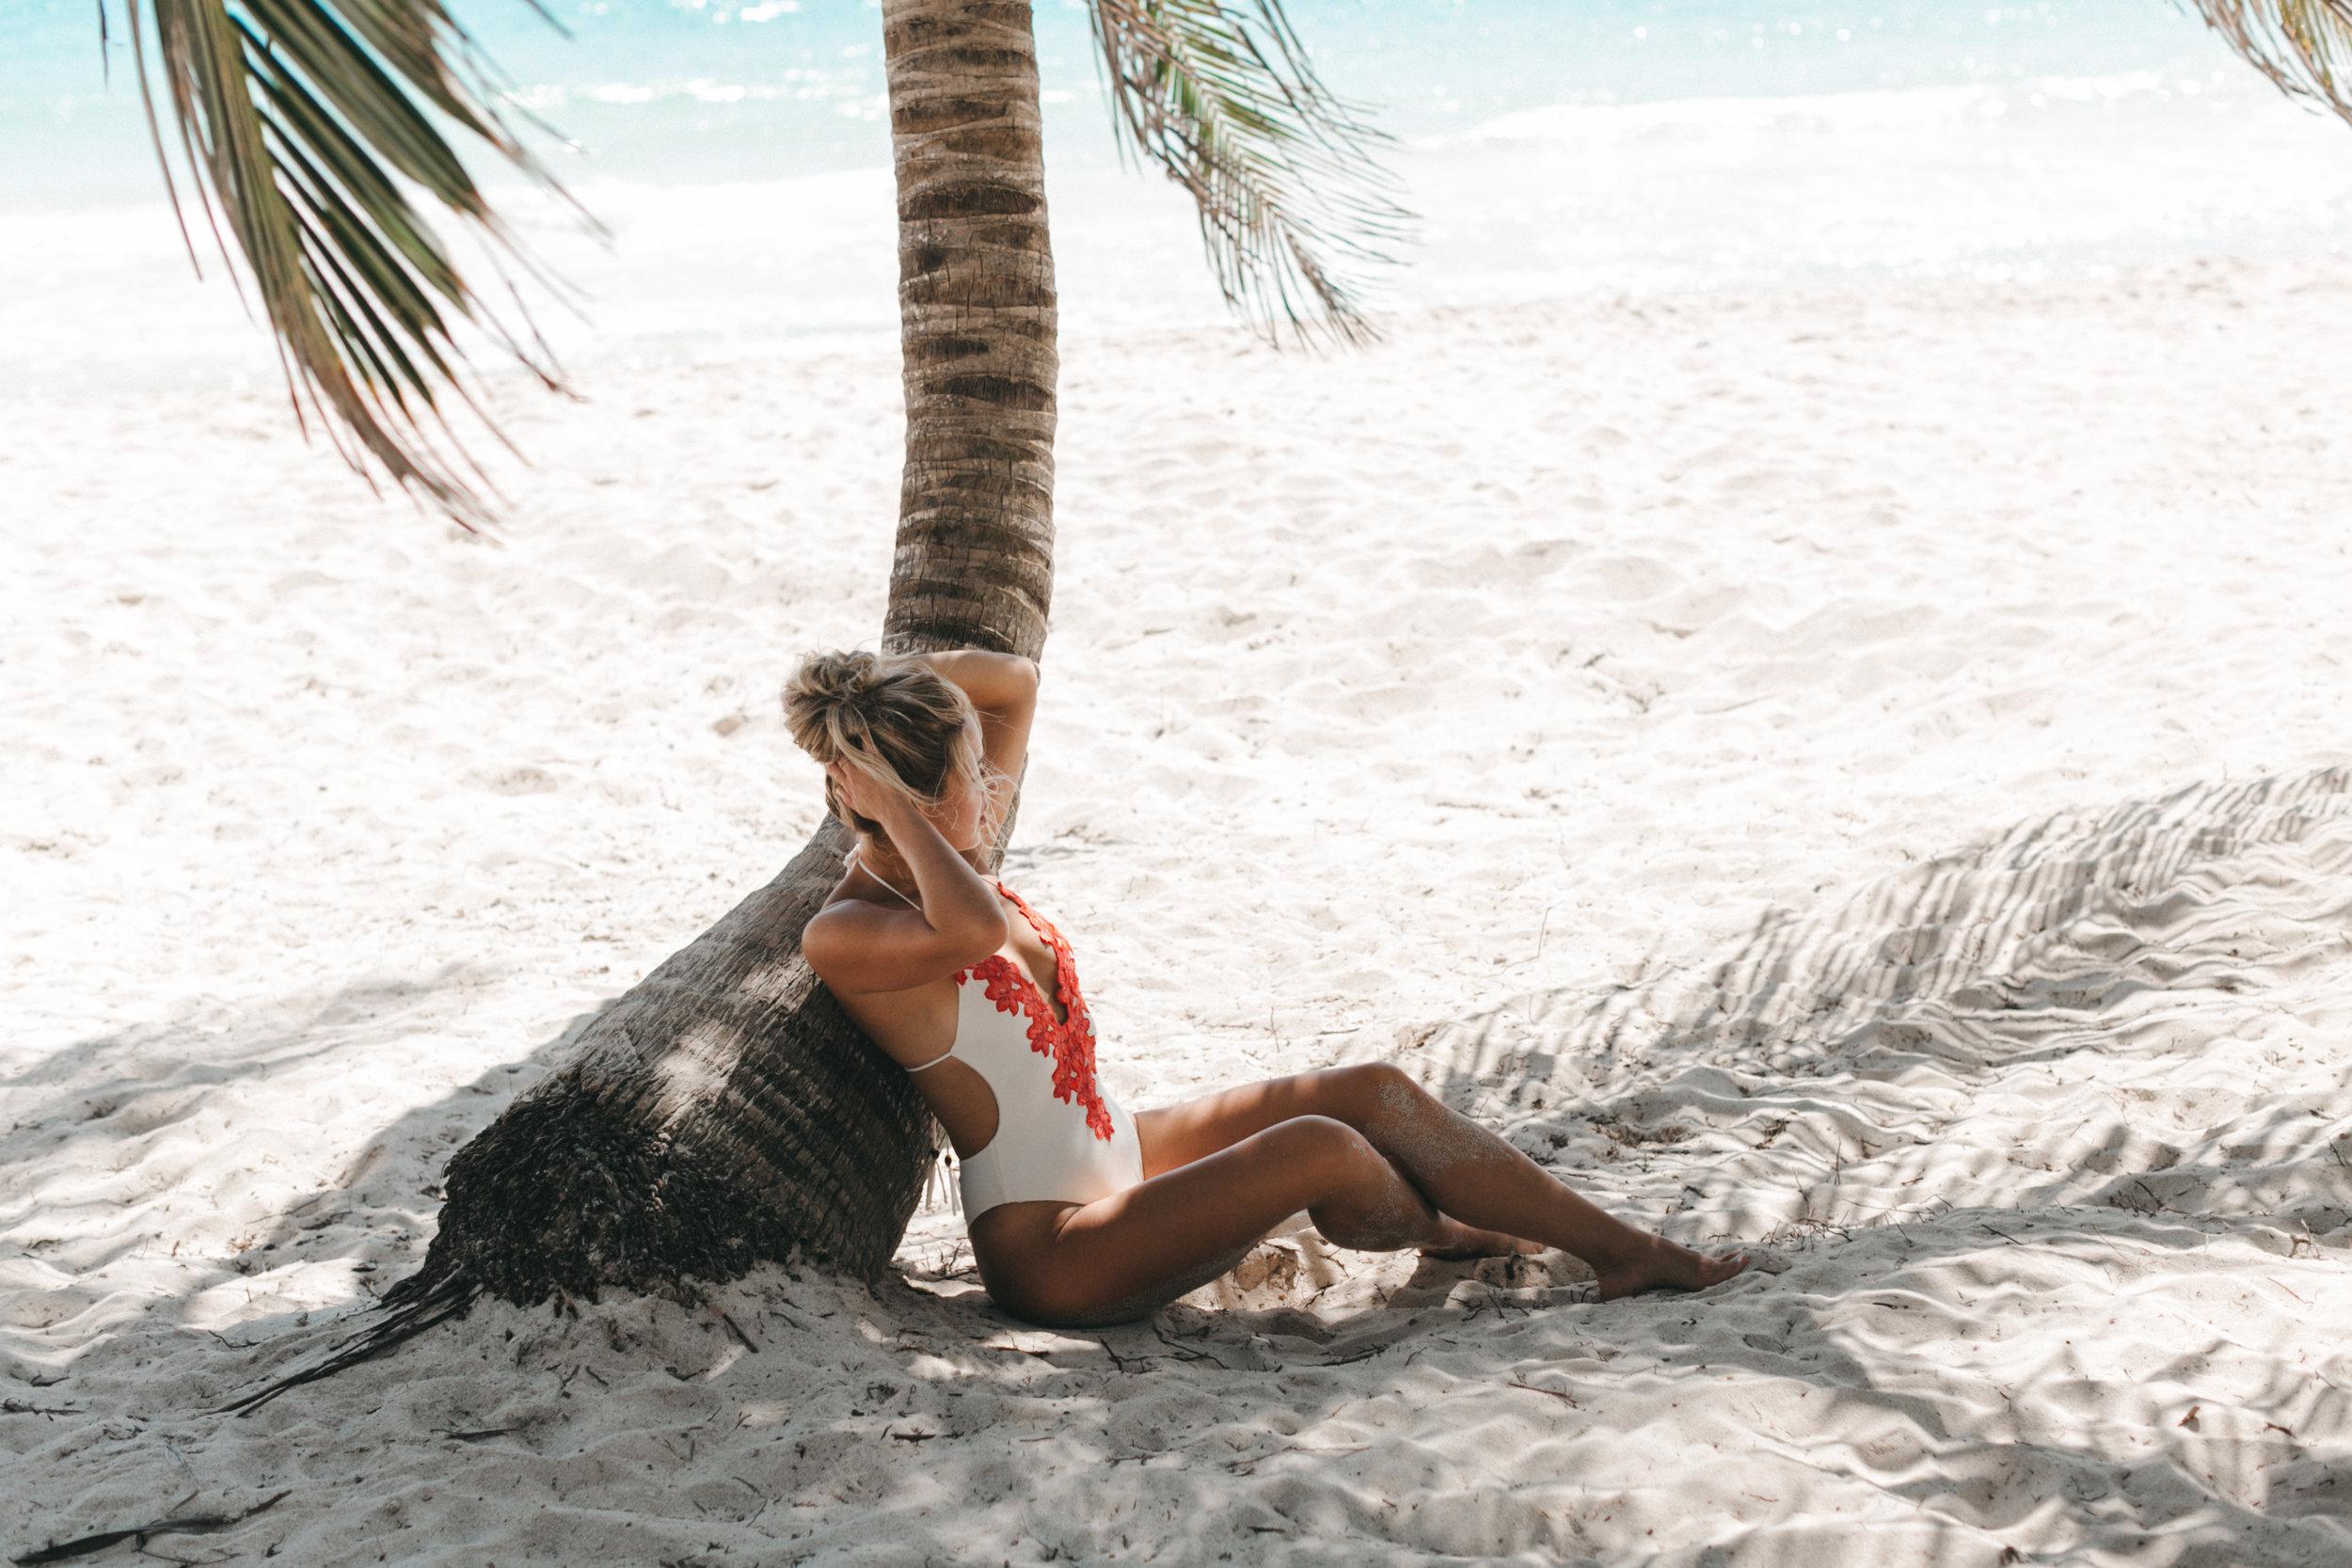 Photos by  Britney Gill   Posse  Set |  Majorelle  Set via  Revolve  |  BAE  Pants |  Tularosa  Suit via  Revolve  |  Faithfull The Brand  Top| Blue Life Swimsuit via  Swimwear World